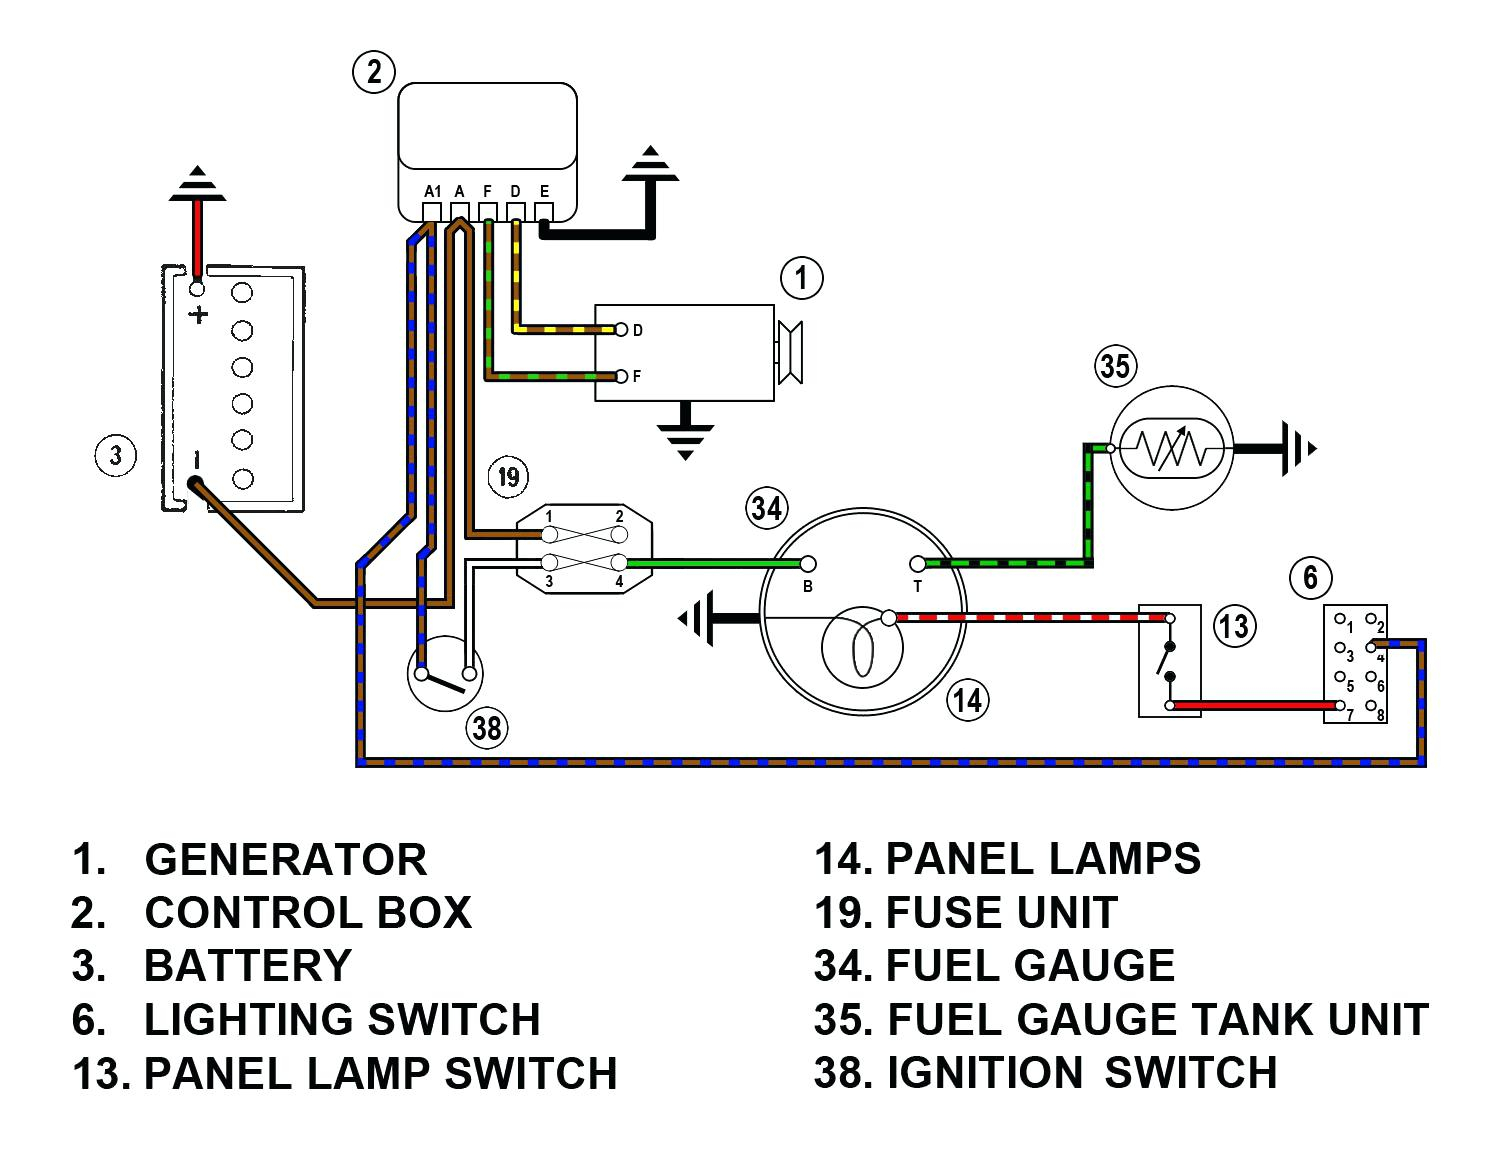 hawke dump trailer wiring diagram sample wiring diagram sample rh faceitsalon com Dump Trailer Wiring Harness Hawke Dump Trailer Wiring Diagram